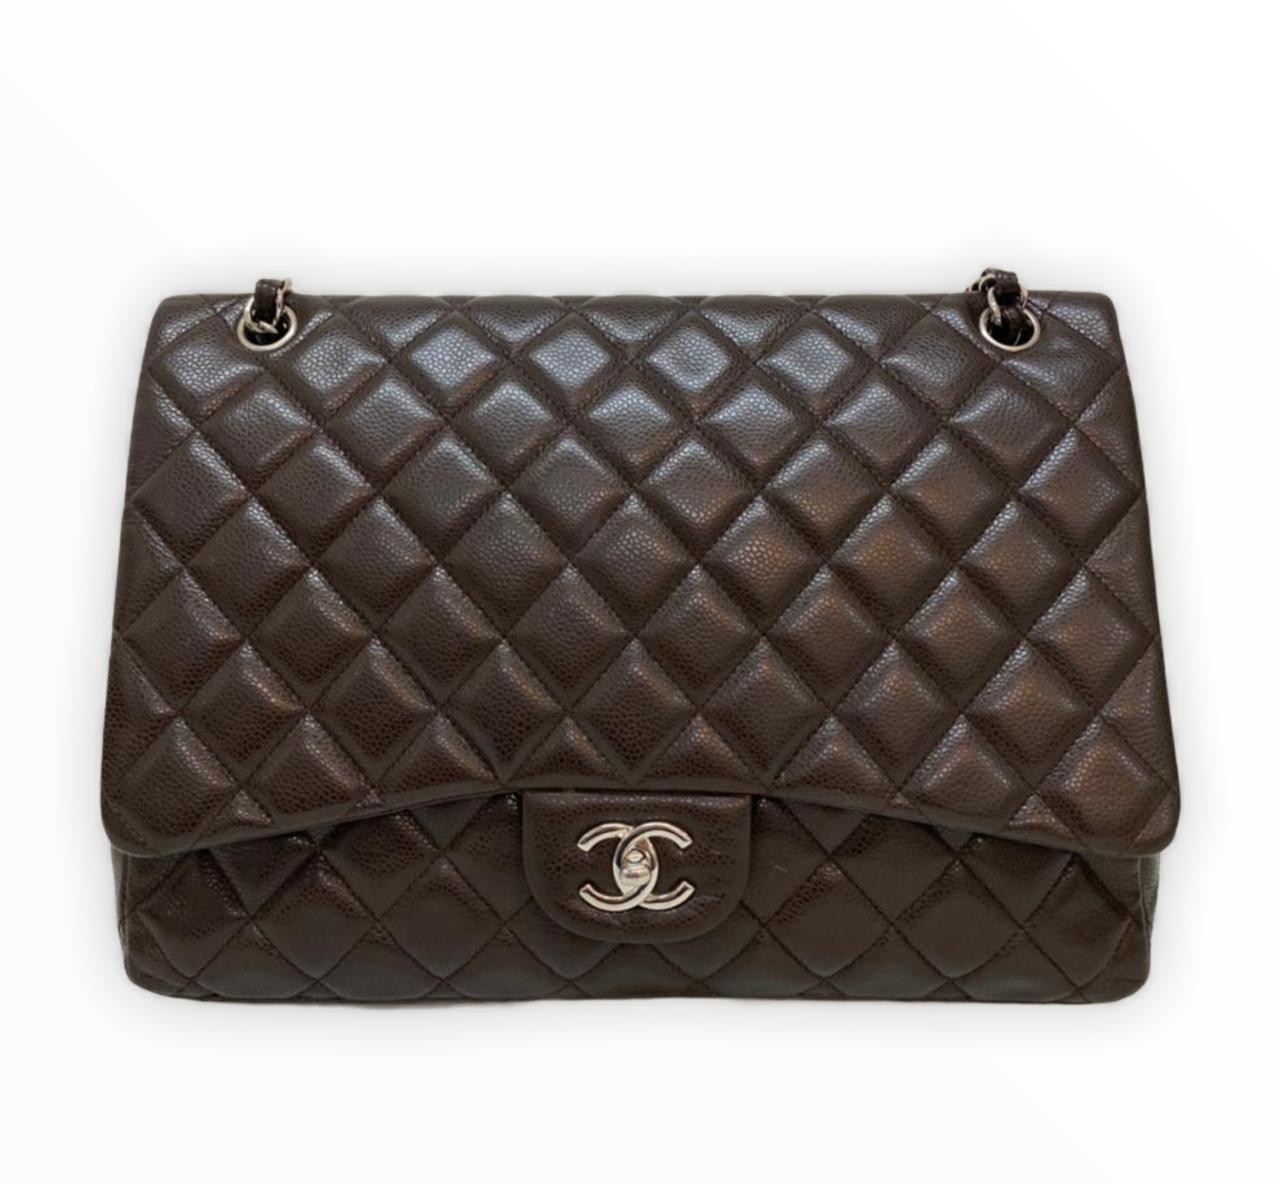 Bolsa Chanel Maxi Caviar